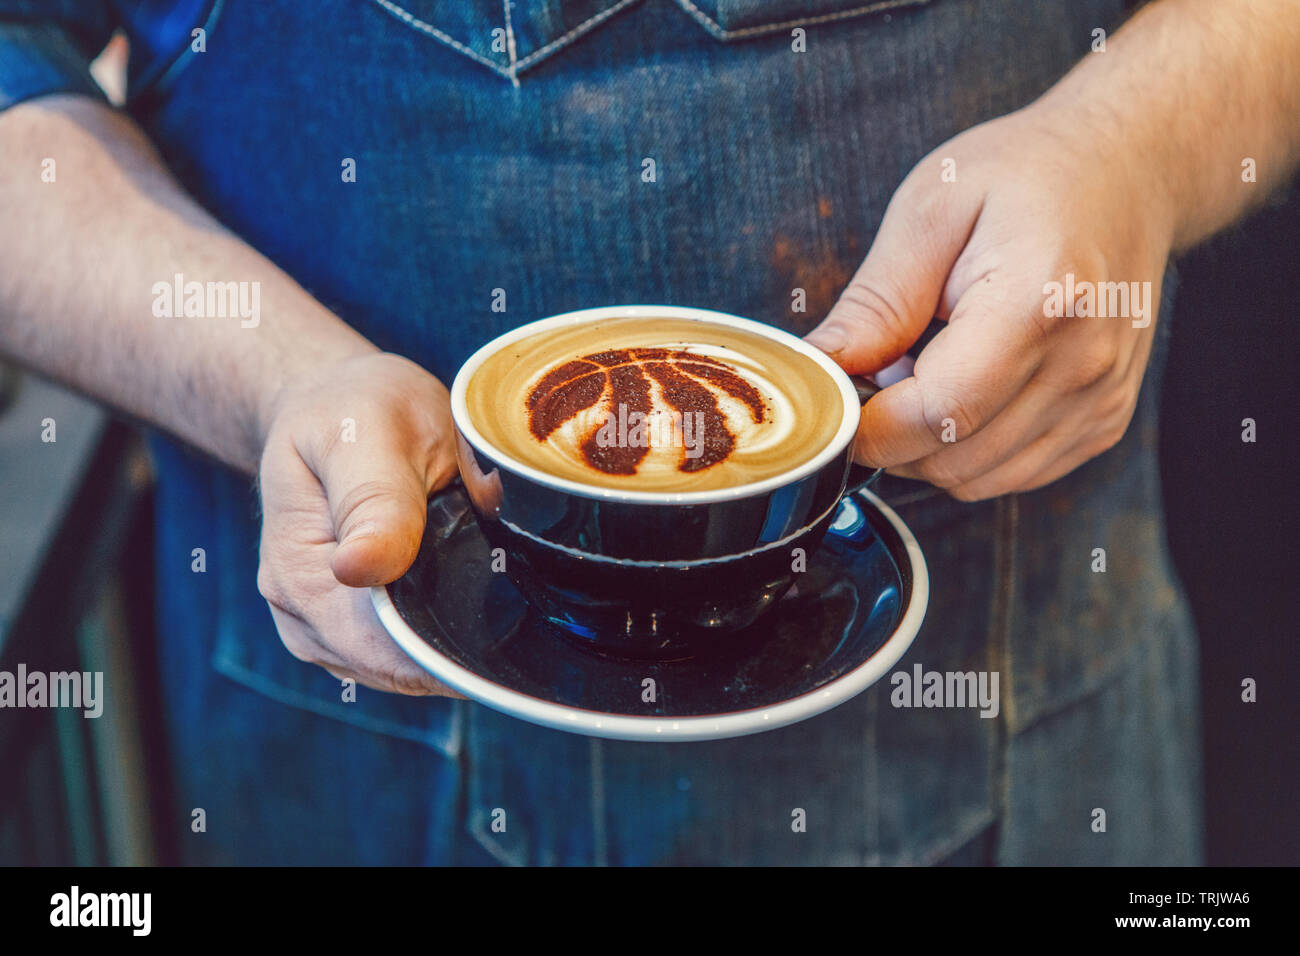 Toronto, Ontario, Canada - June 6, 2019: Closeup of barista hands holding black cup of coffee cappuccino with Toronto Raptors basketball team logo - Stock Image